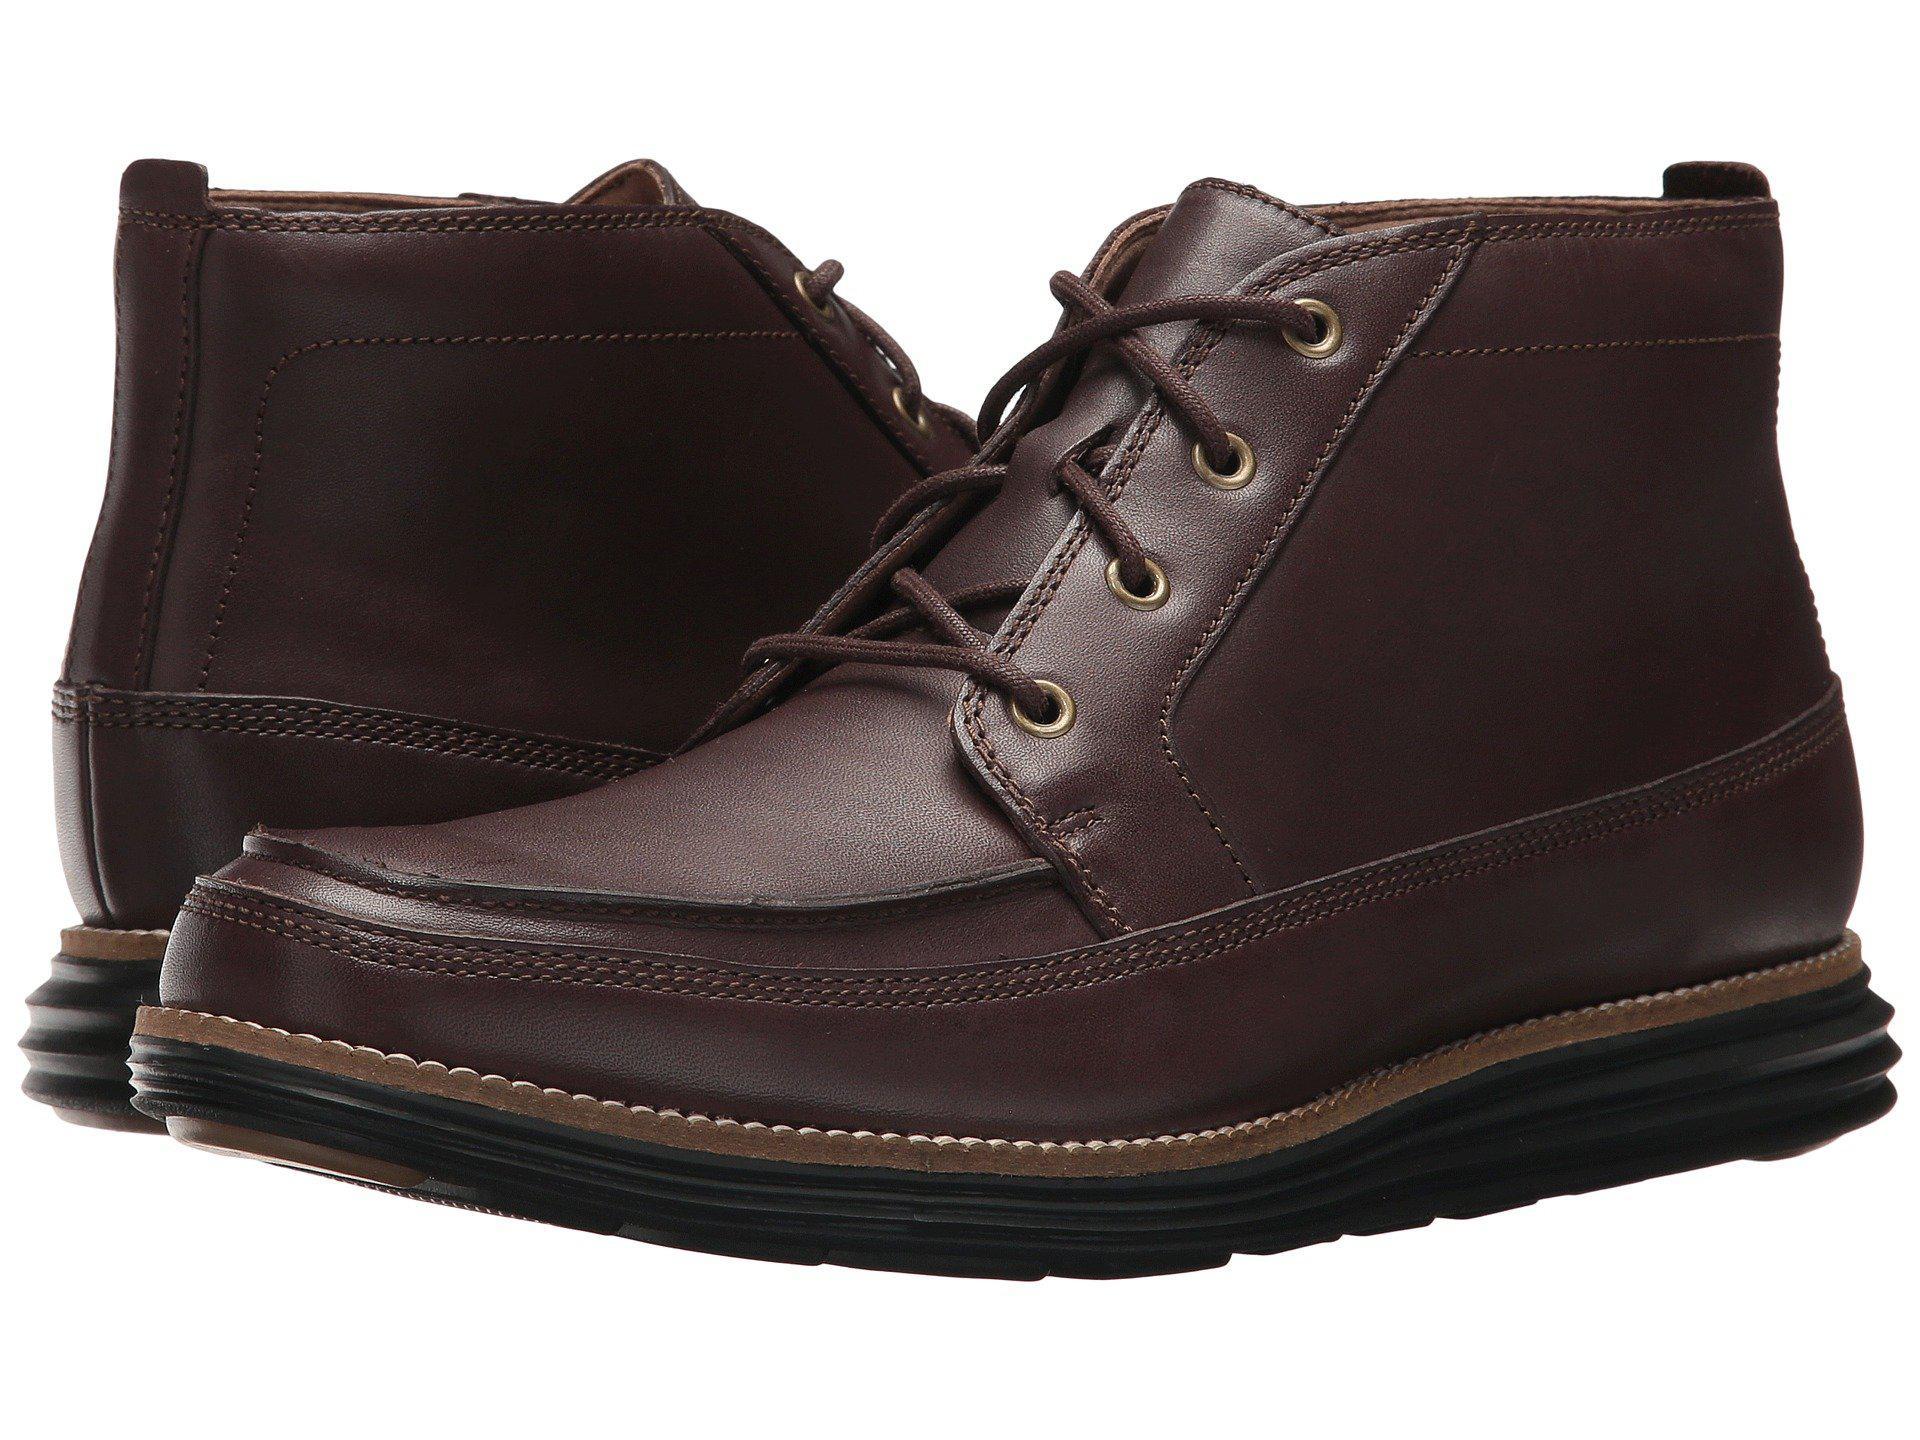 9cfc7b8043d Lyst - Cole Haan Original Grand.os Moc Chukka Ii in Brown for Men